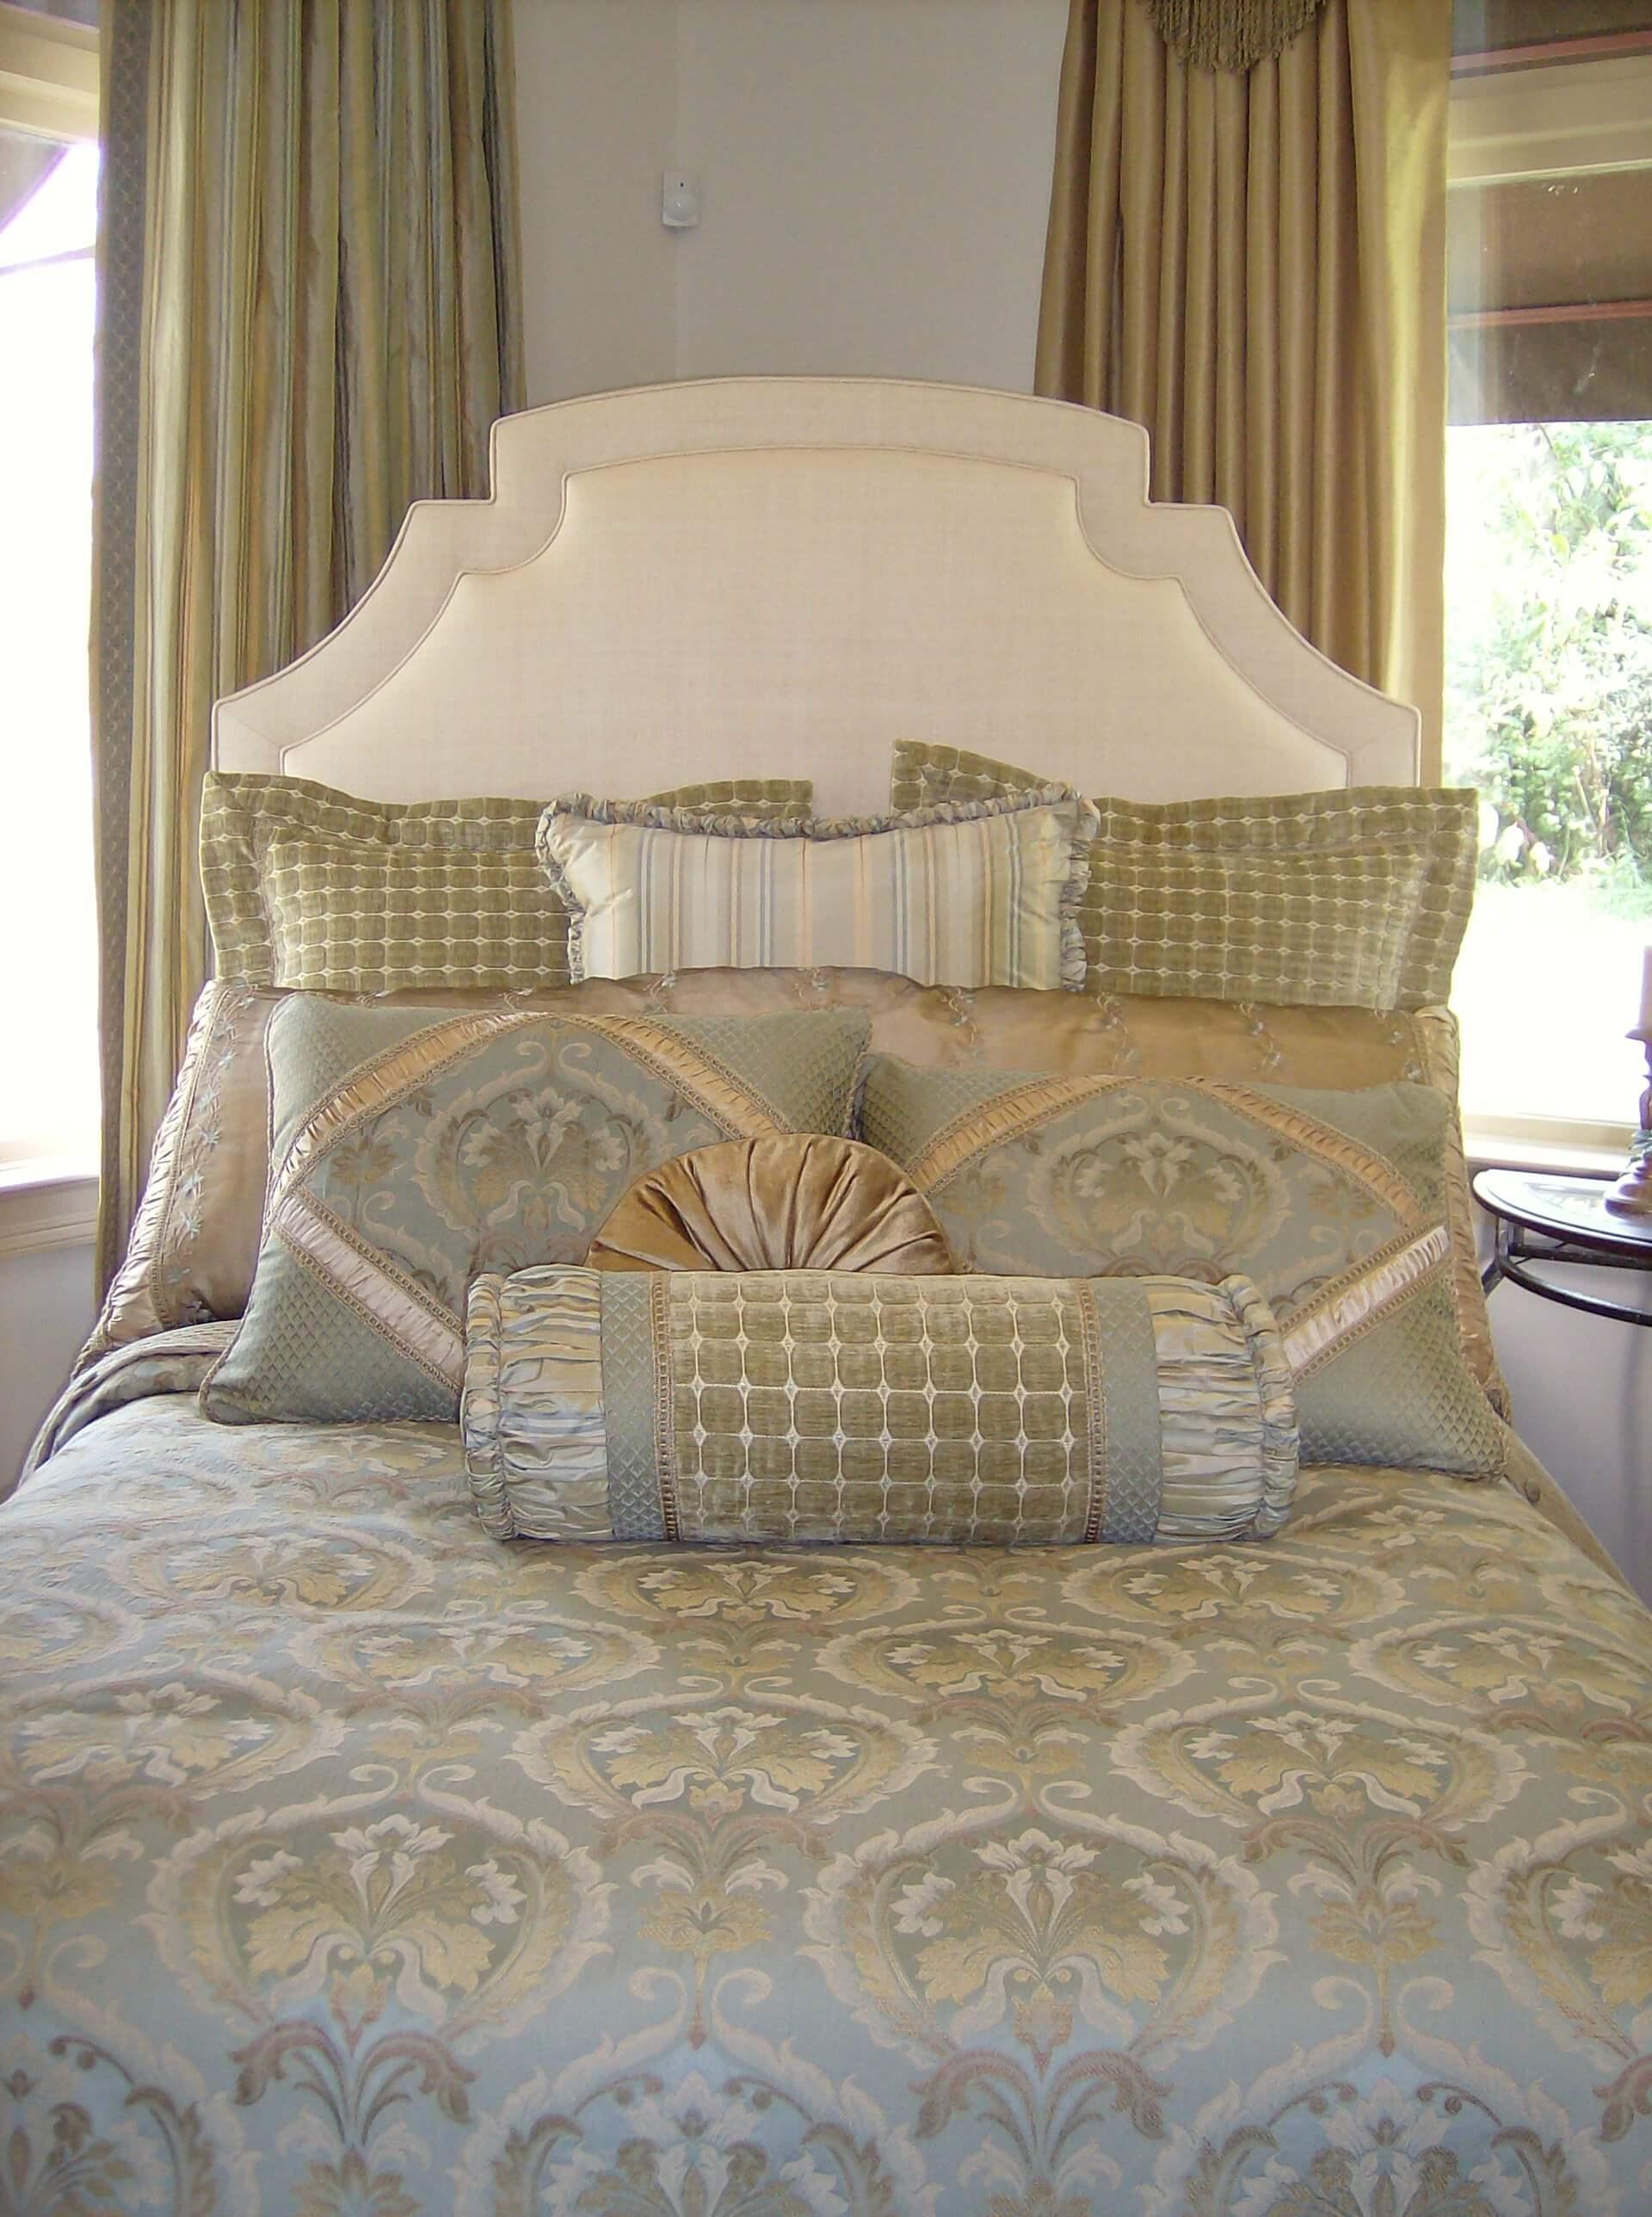 custom-bedding-linens-fabric-atlanta-georgia-5.JPG